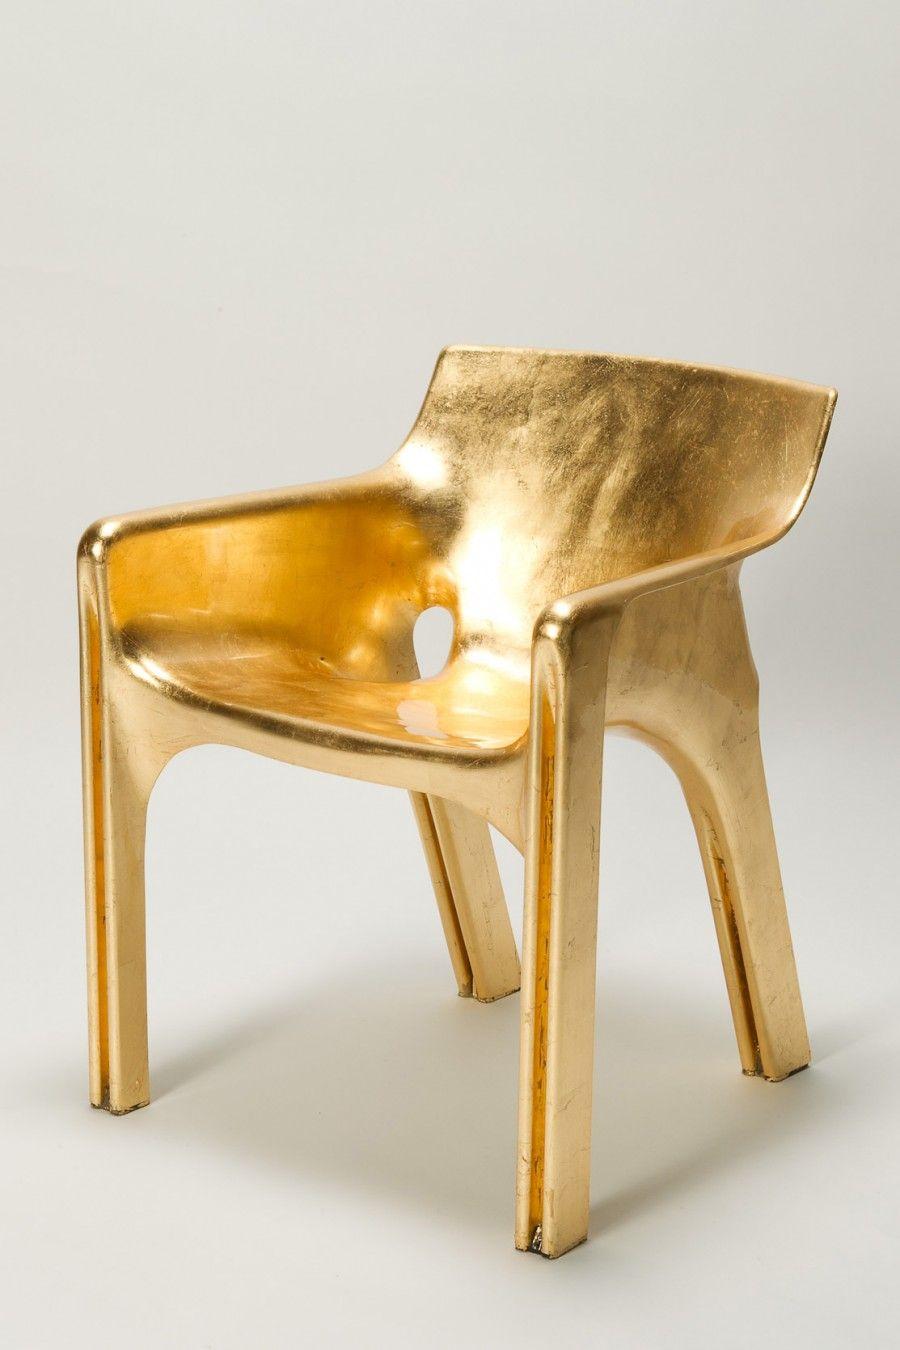 Golden magistretti karma chair vico magistretti get in my house